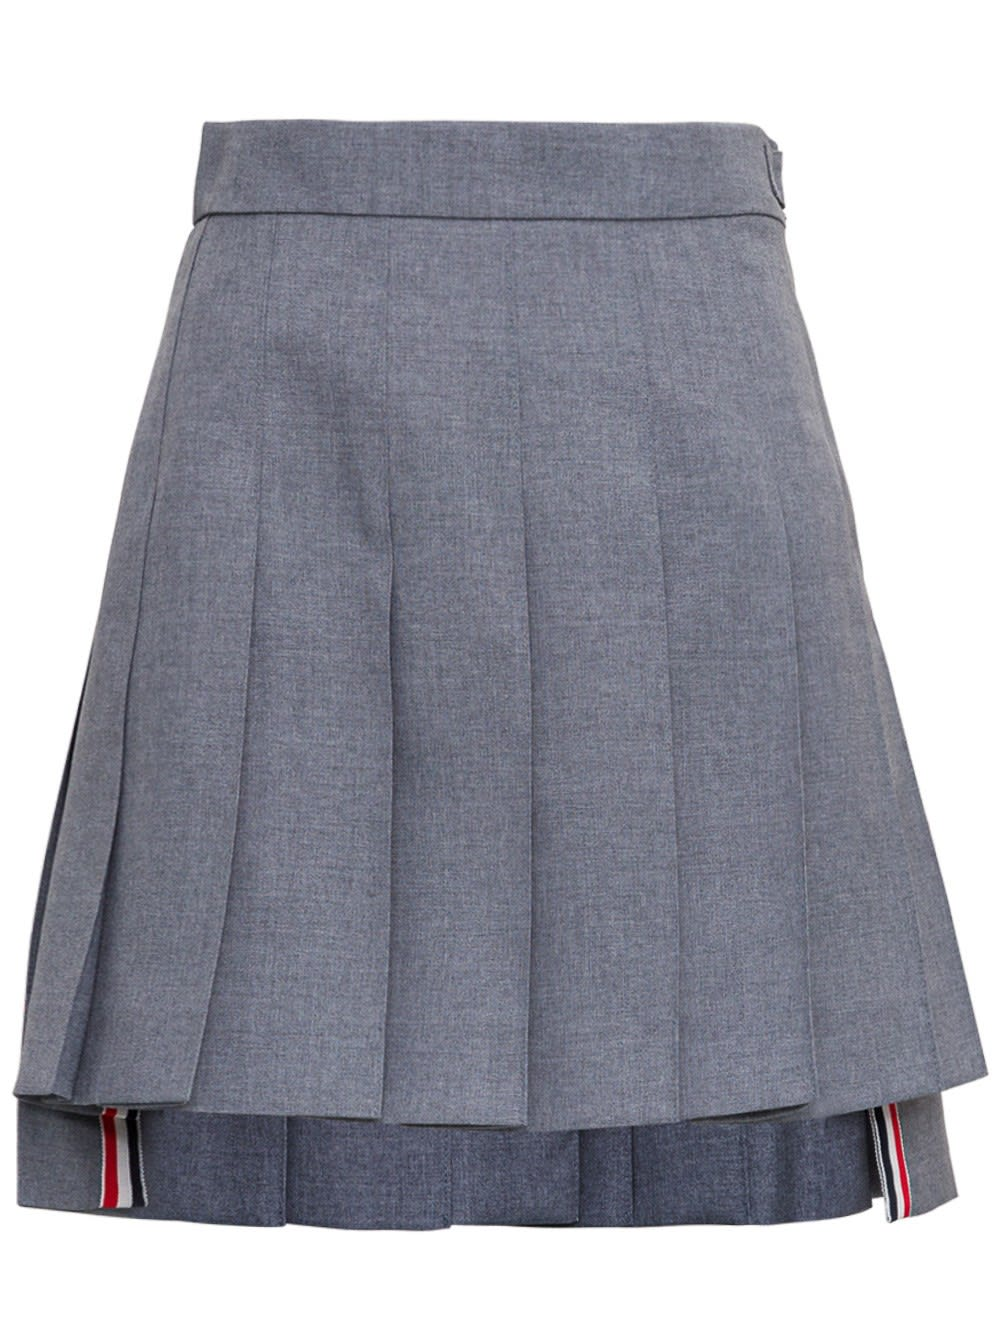 Thom Browne Skirts GREY FLARED PLEATED WOOL SKIRT